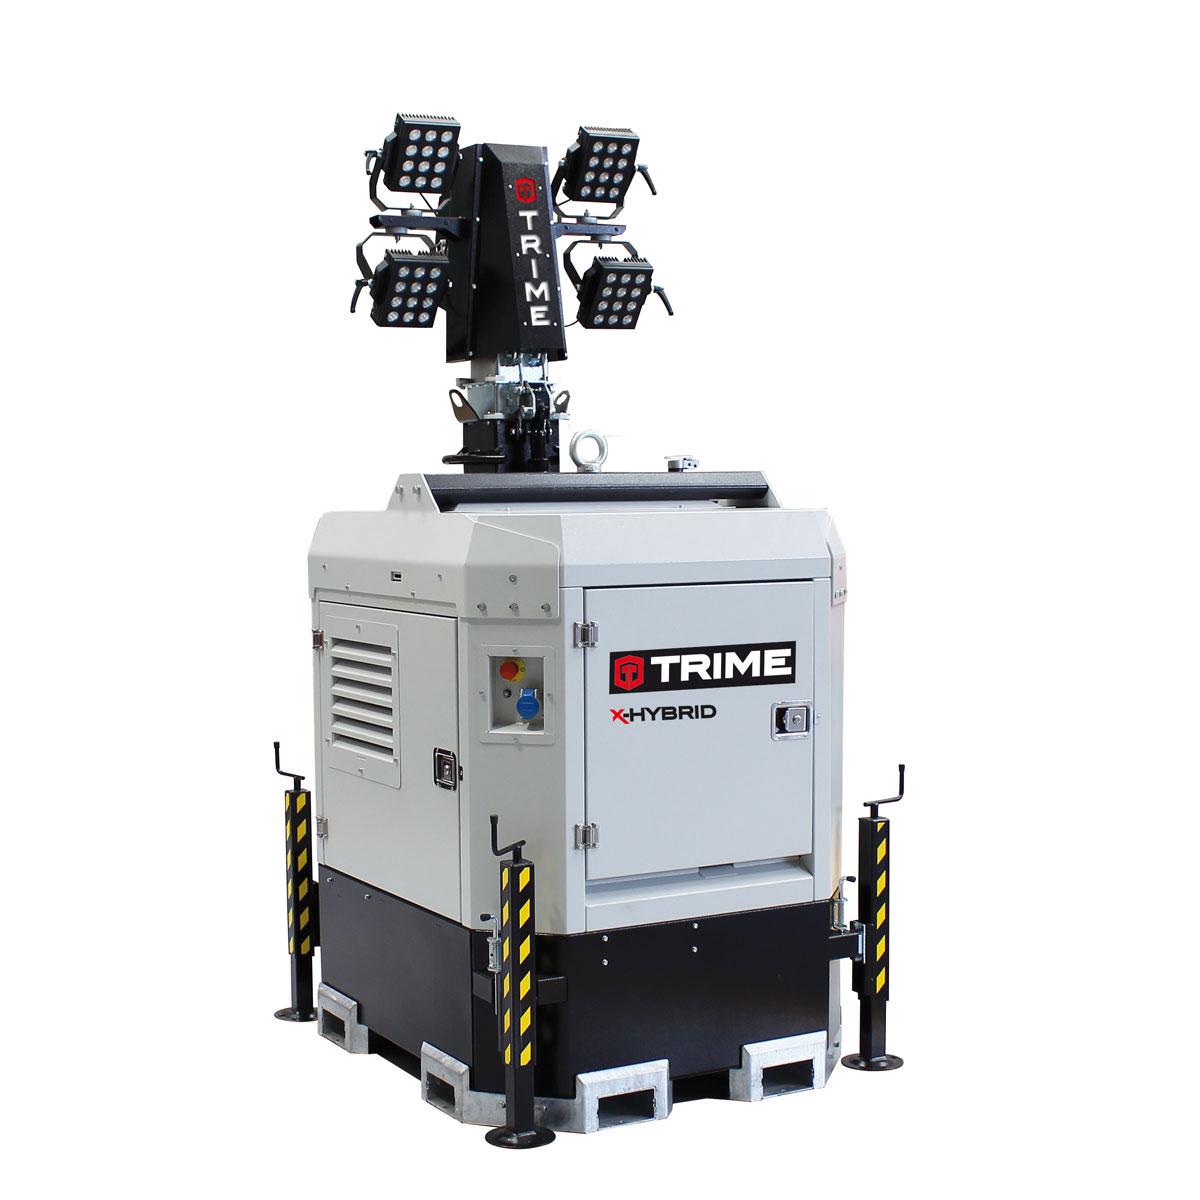 belysningsmast-led-x-hybrid-4x150W-stangd